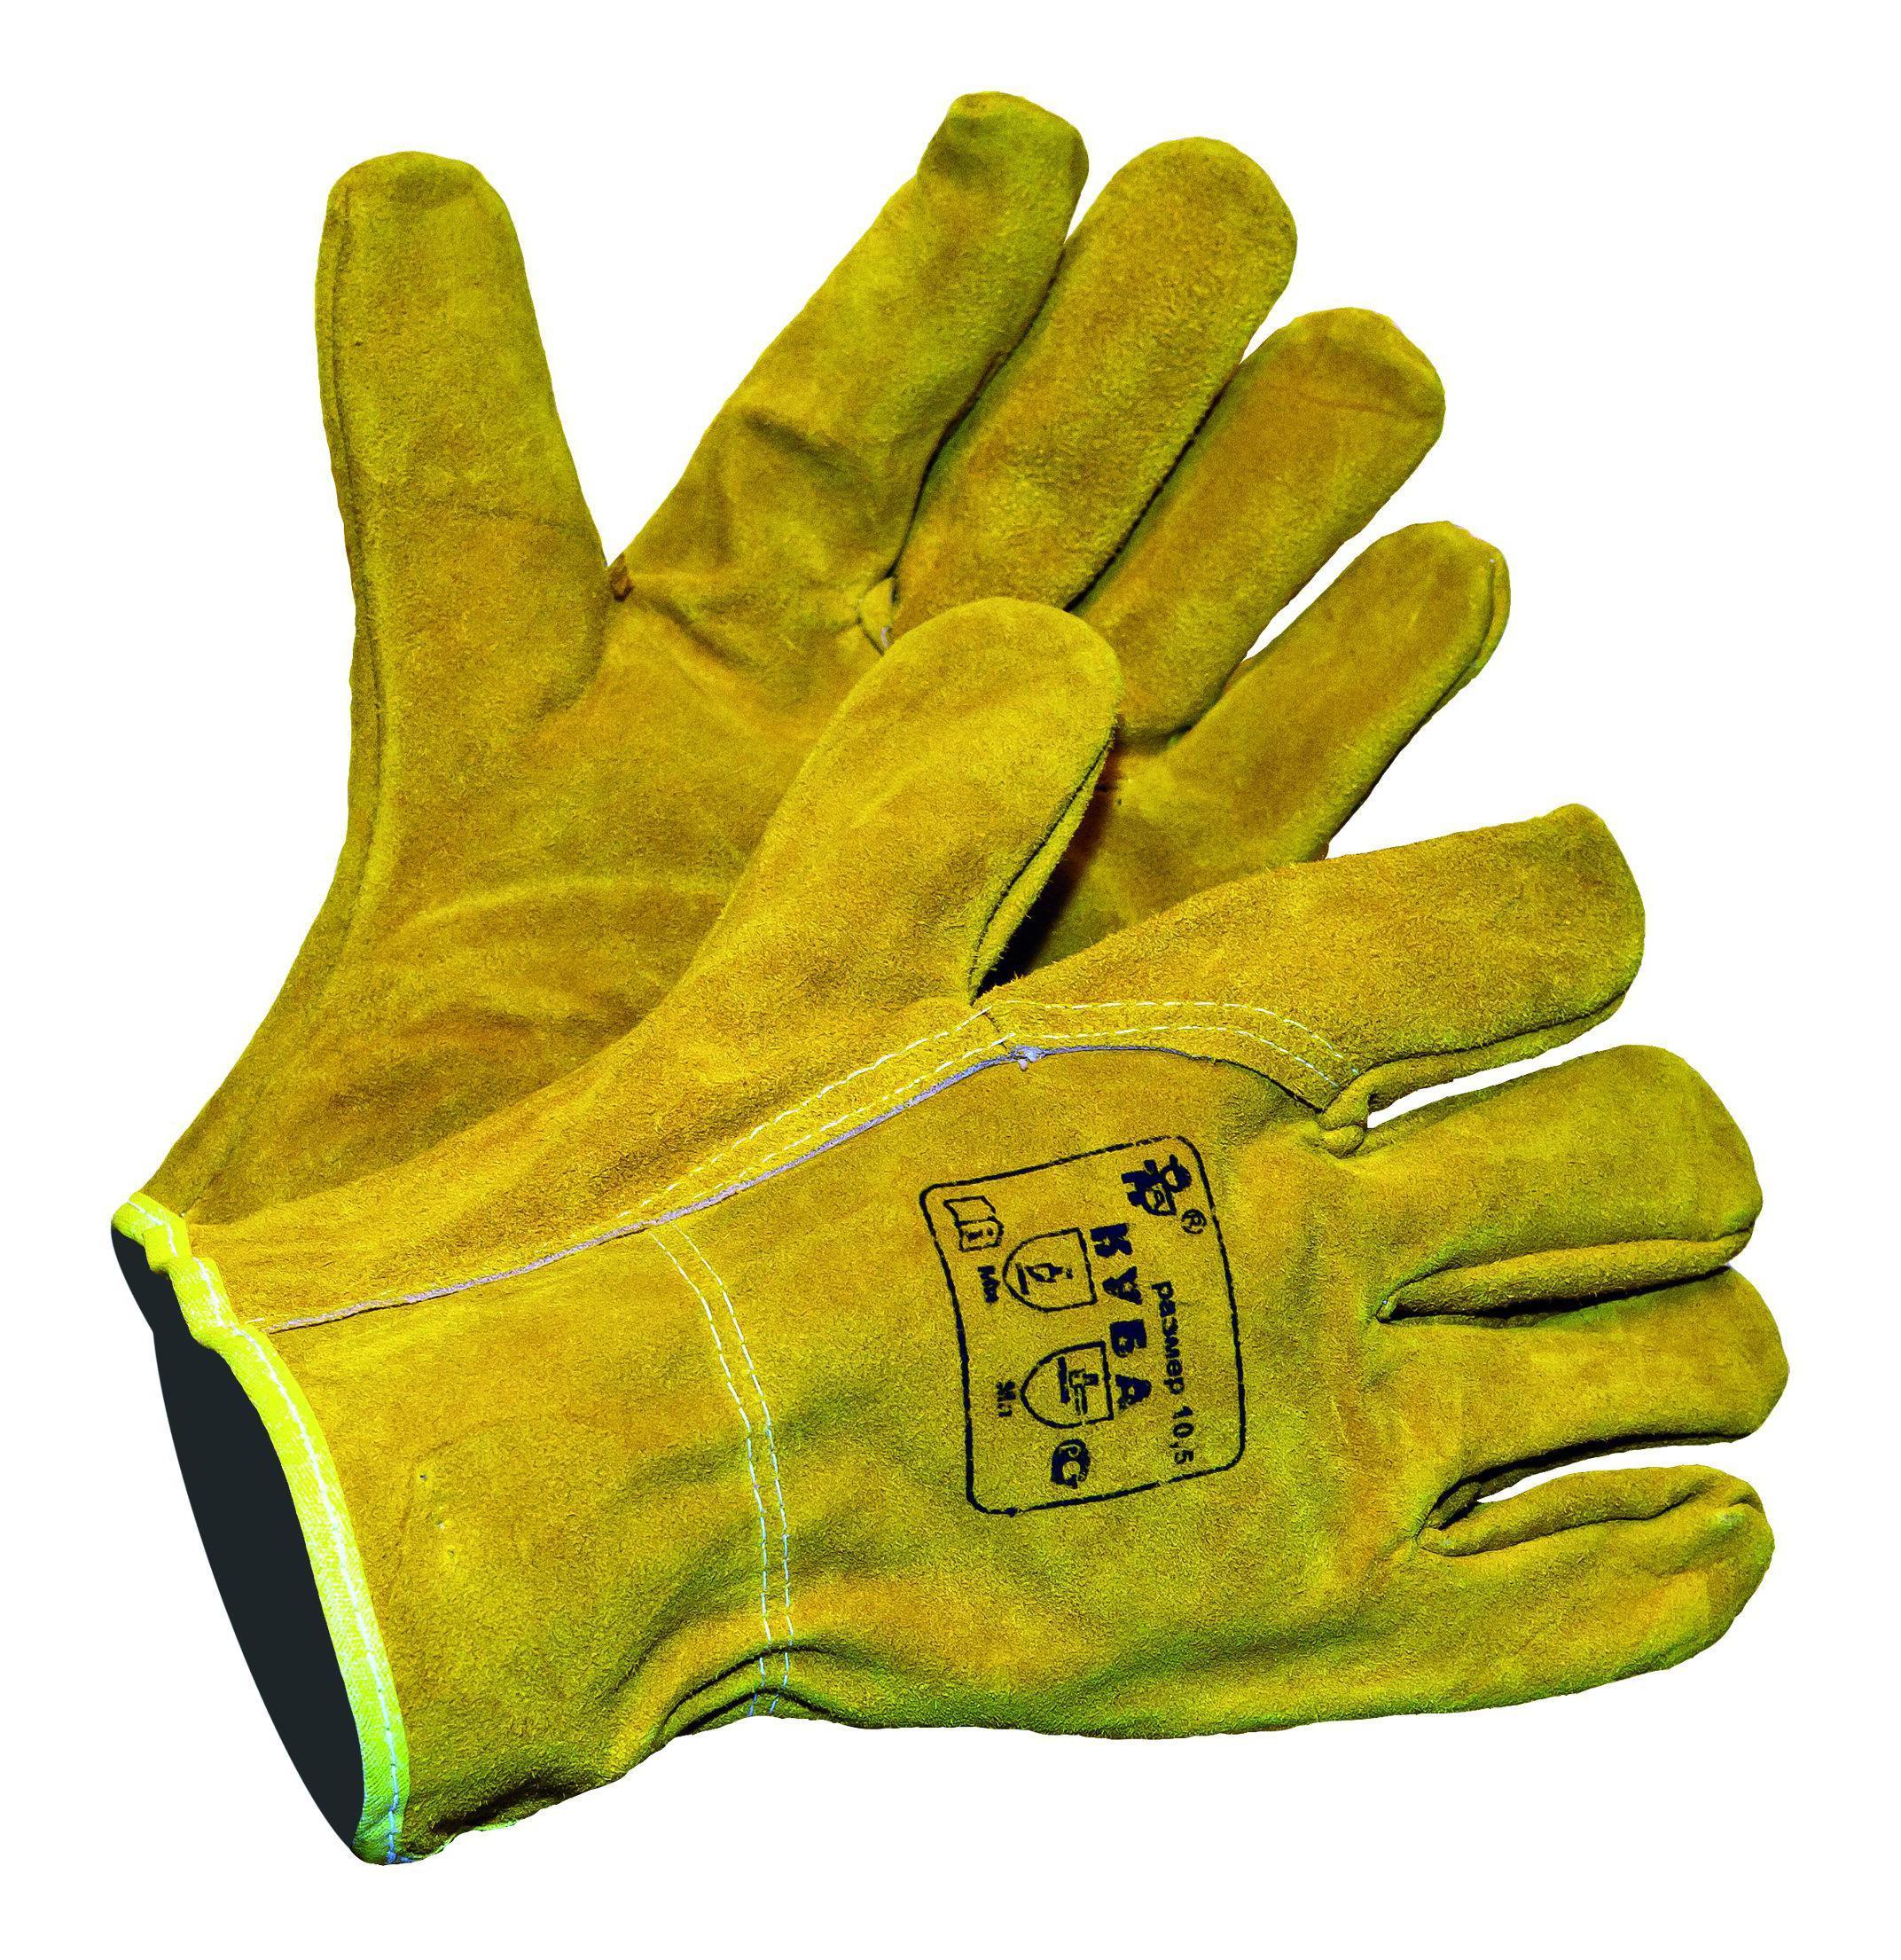 Перчатки AmparoПерчатки и рукавицы<br>Тип: перчатки,<br>Тип перчаток: спилковые,<br>Пол: унисекс,<br>Размер: 10.5,<br>Цвет: желтый<br>